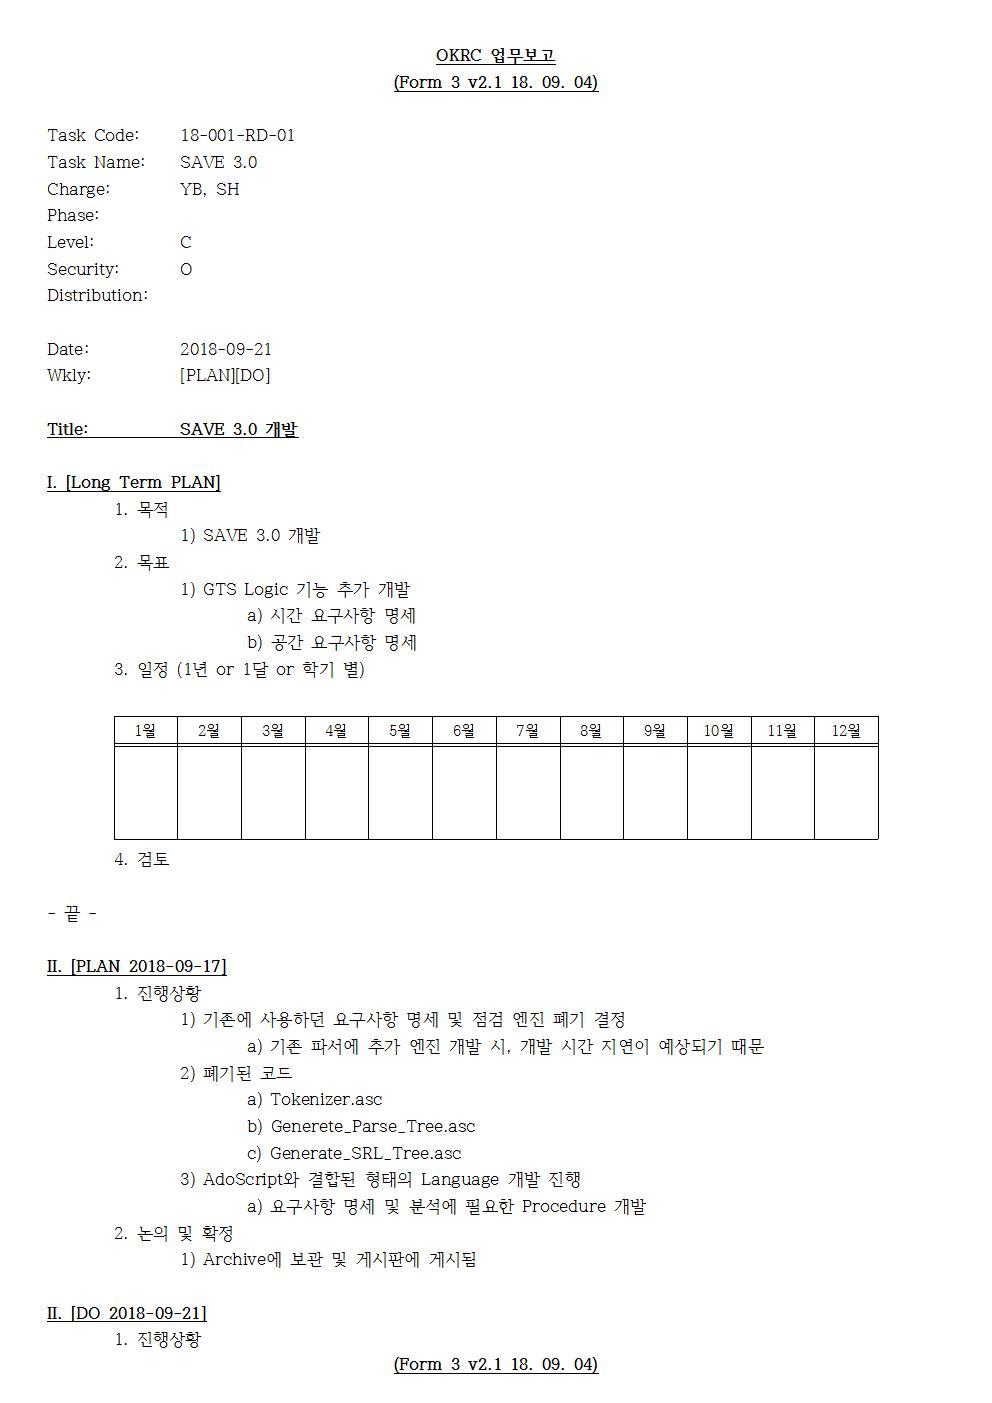 D-[18-001-RD-01]-[SAVE 3.0]-[2018-09-21][SH]001.jpg